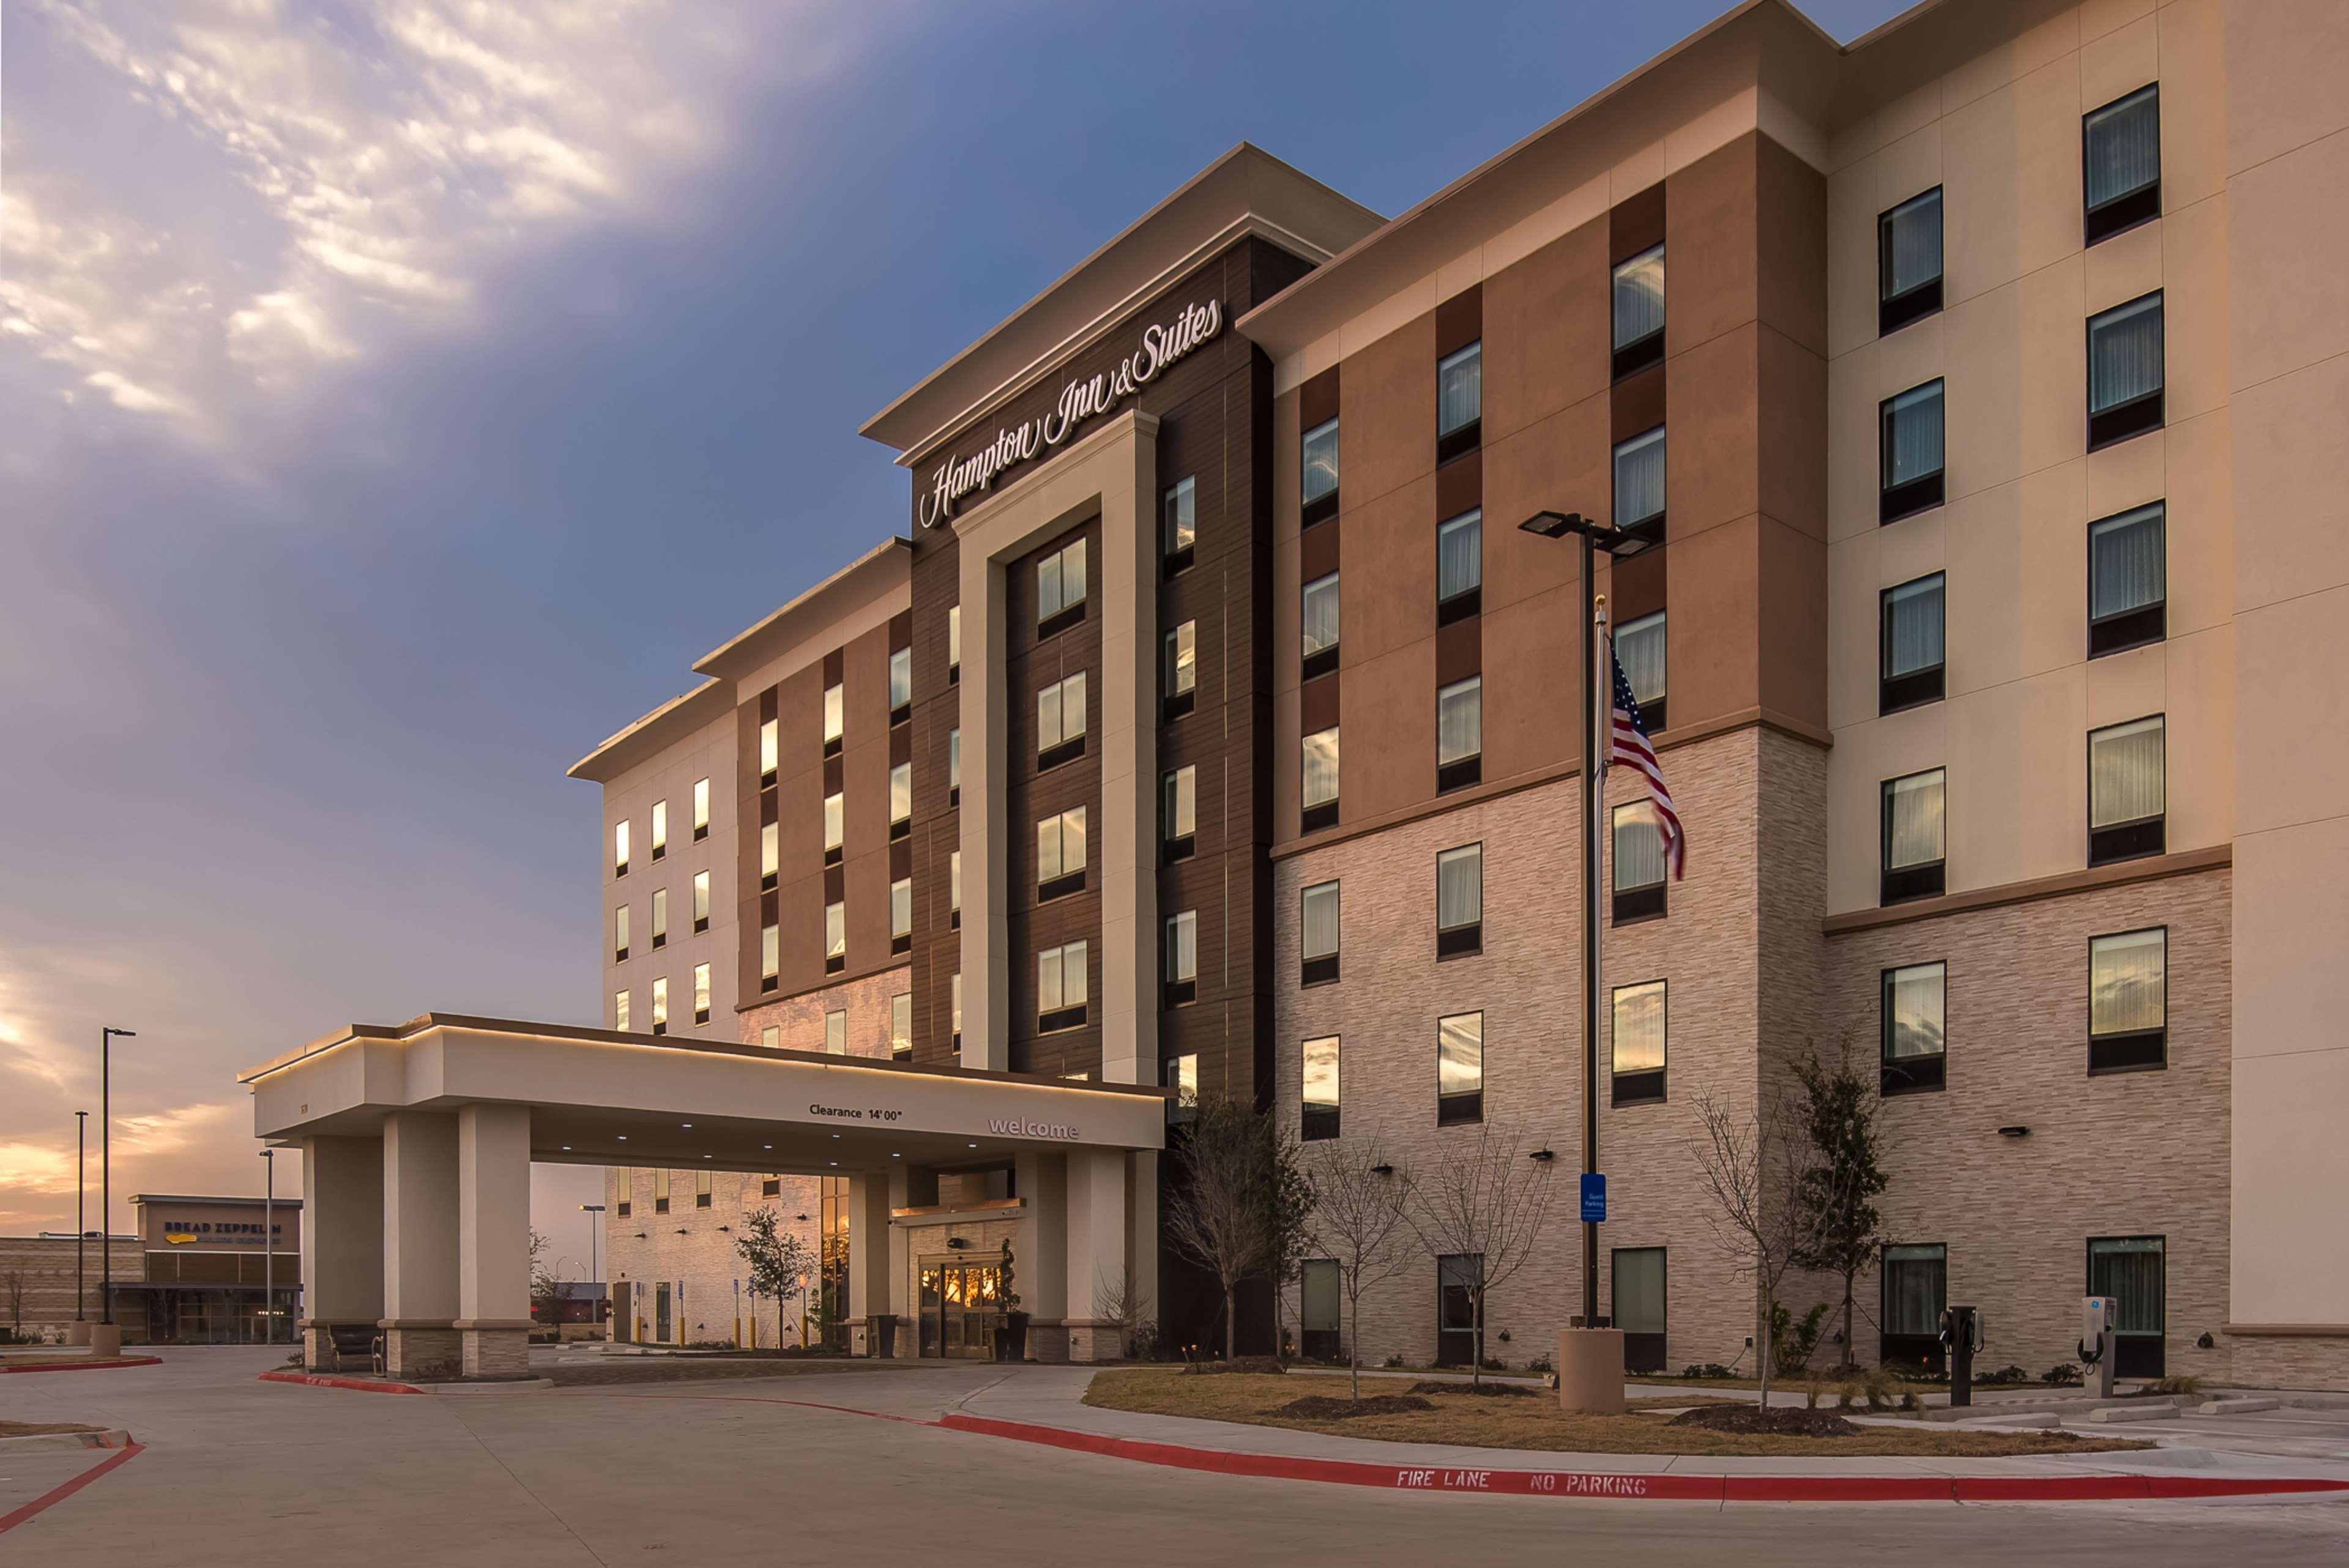 Hampton Inn & Suites Dallas-The Colony, TX image 2